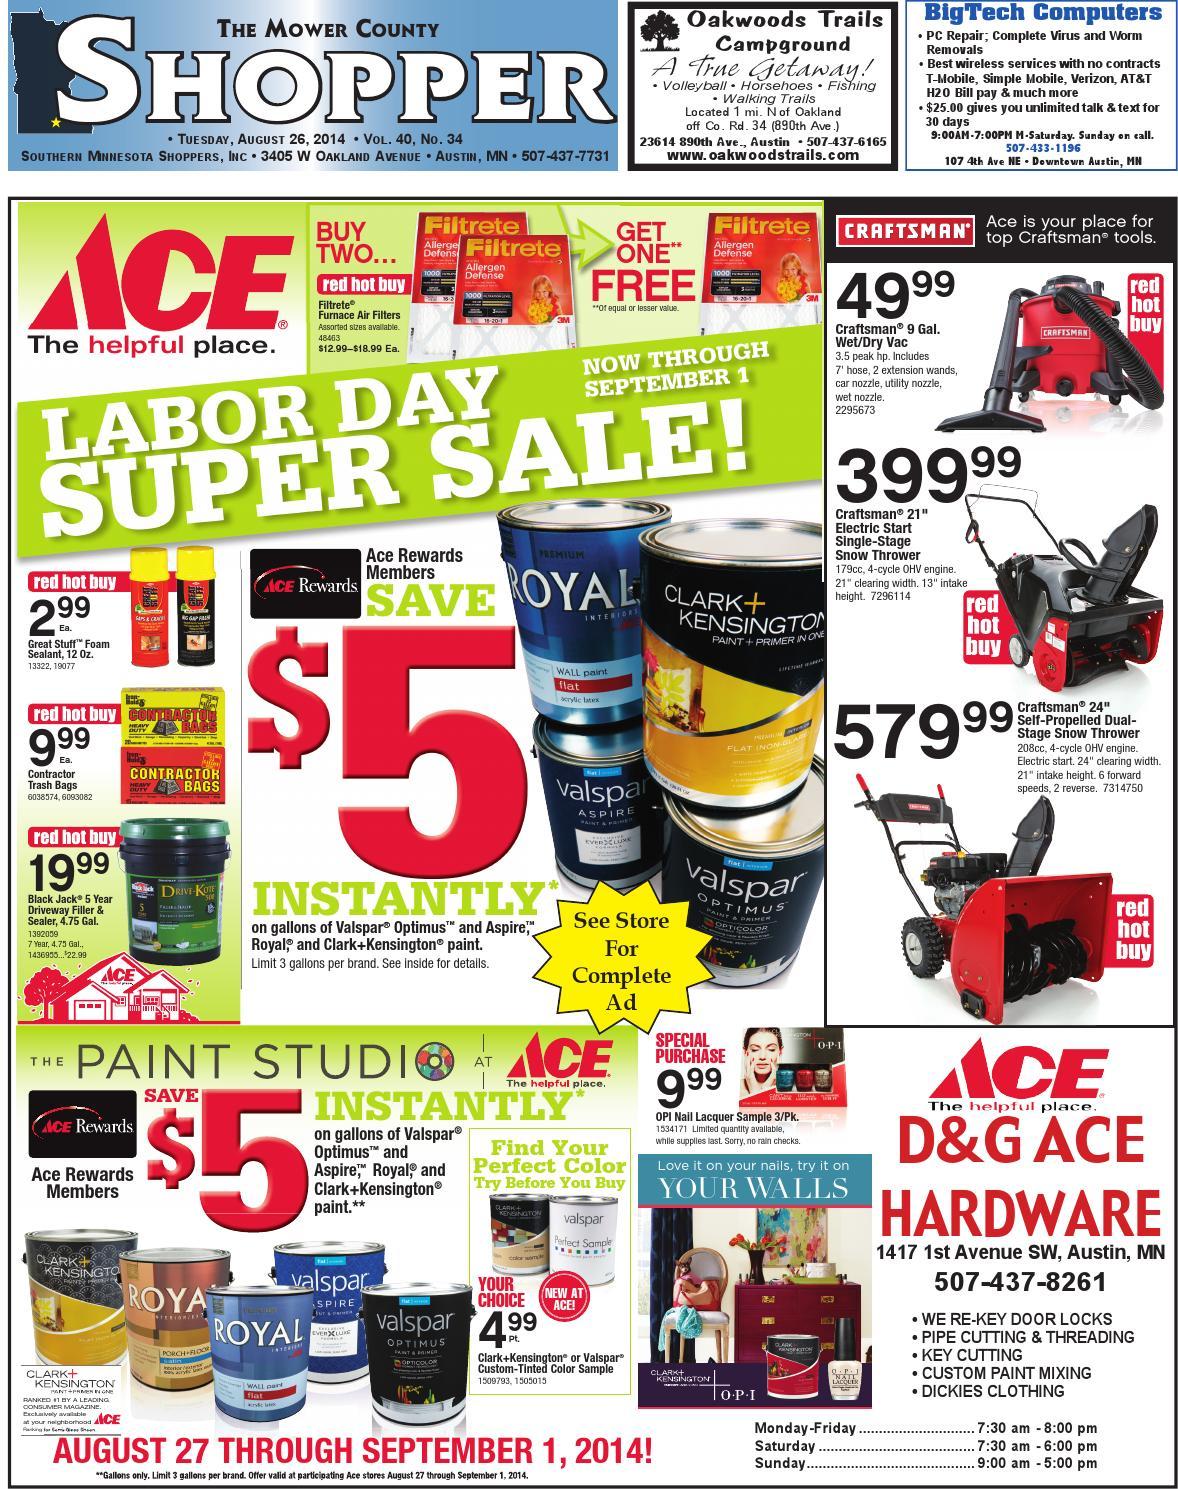 MCS 08 26 2014 by Mower County Shopper - issuu